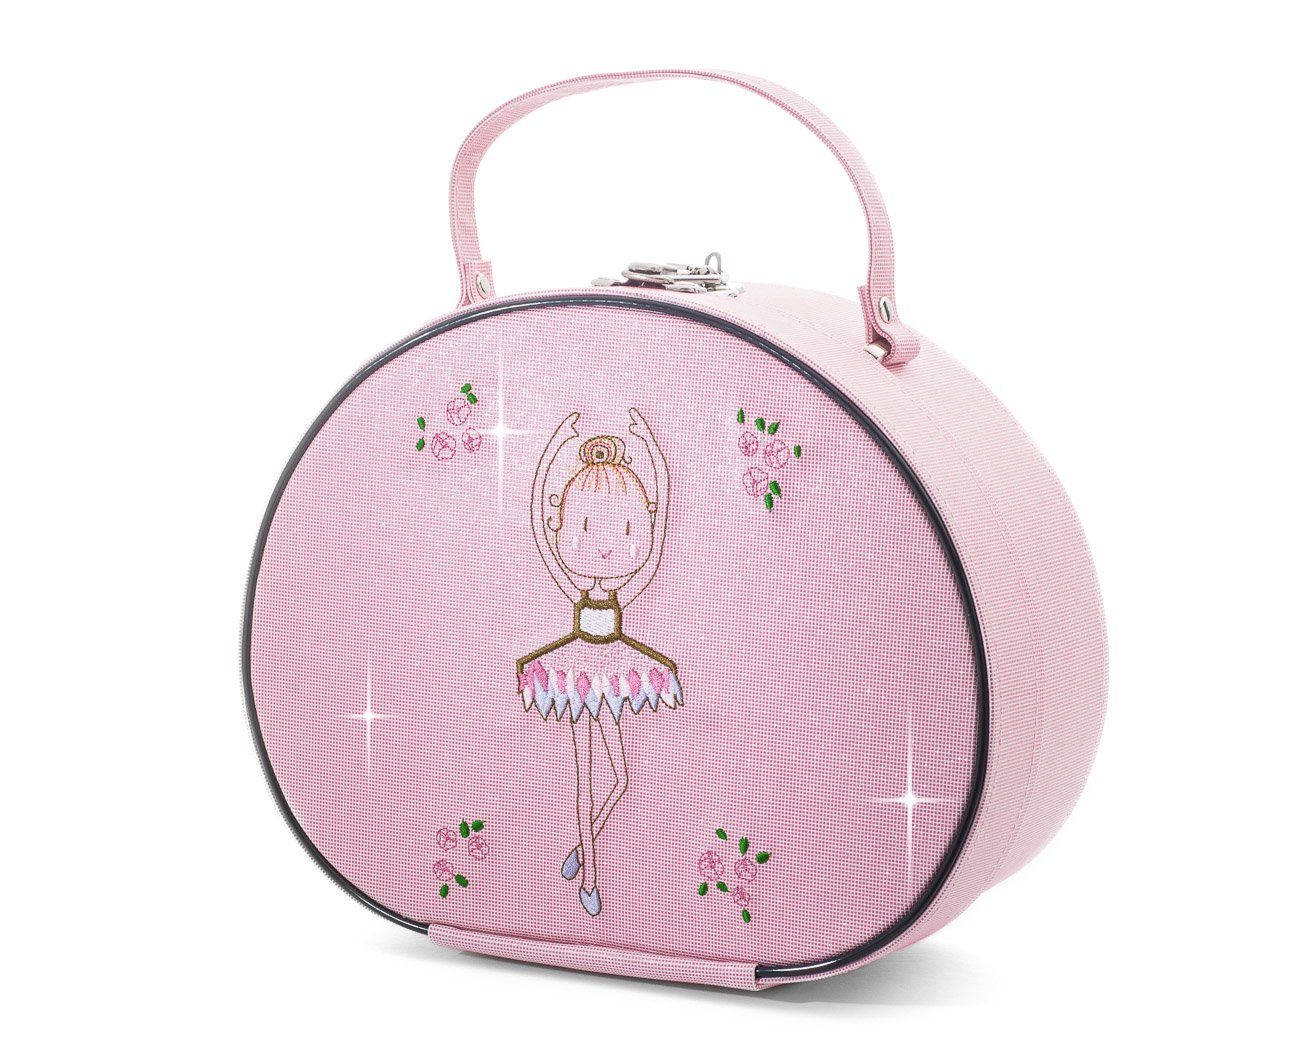 Katz Dancewear Pink Sparkly Shimmer Ballerina Dance Ballet Hand Vanity Hard Case Bag By KB102 Christmas Birthday